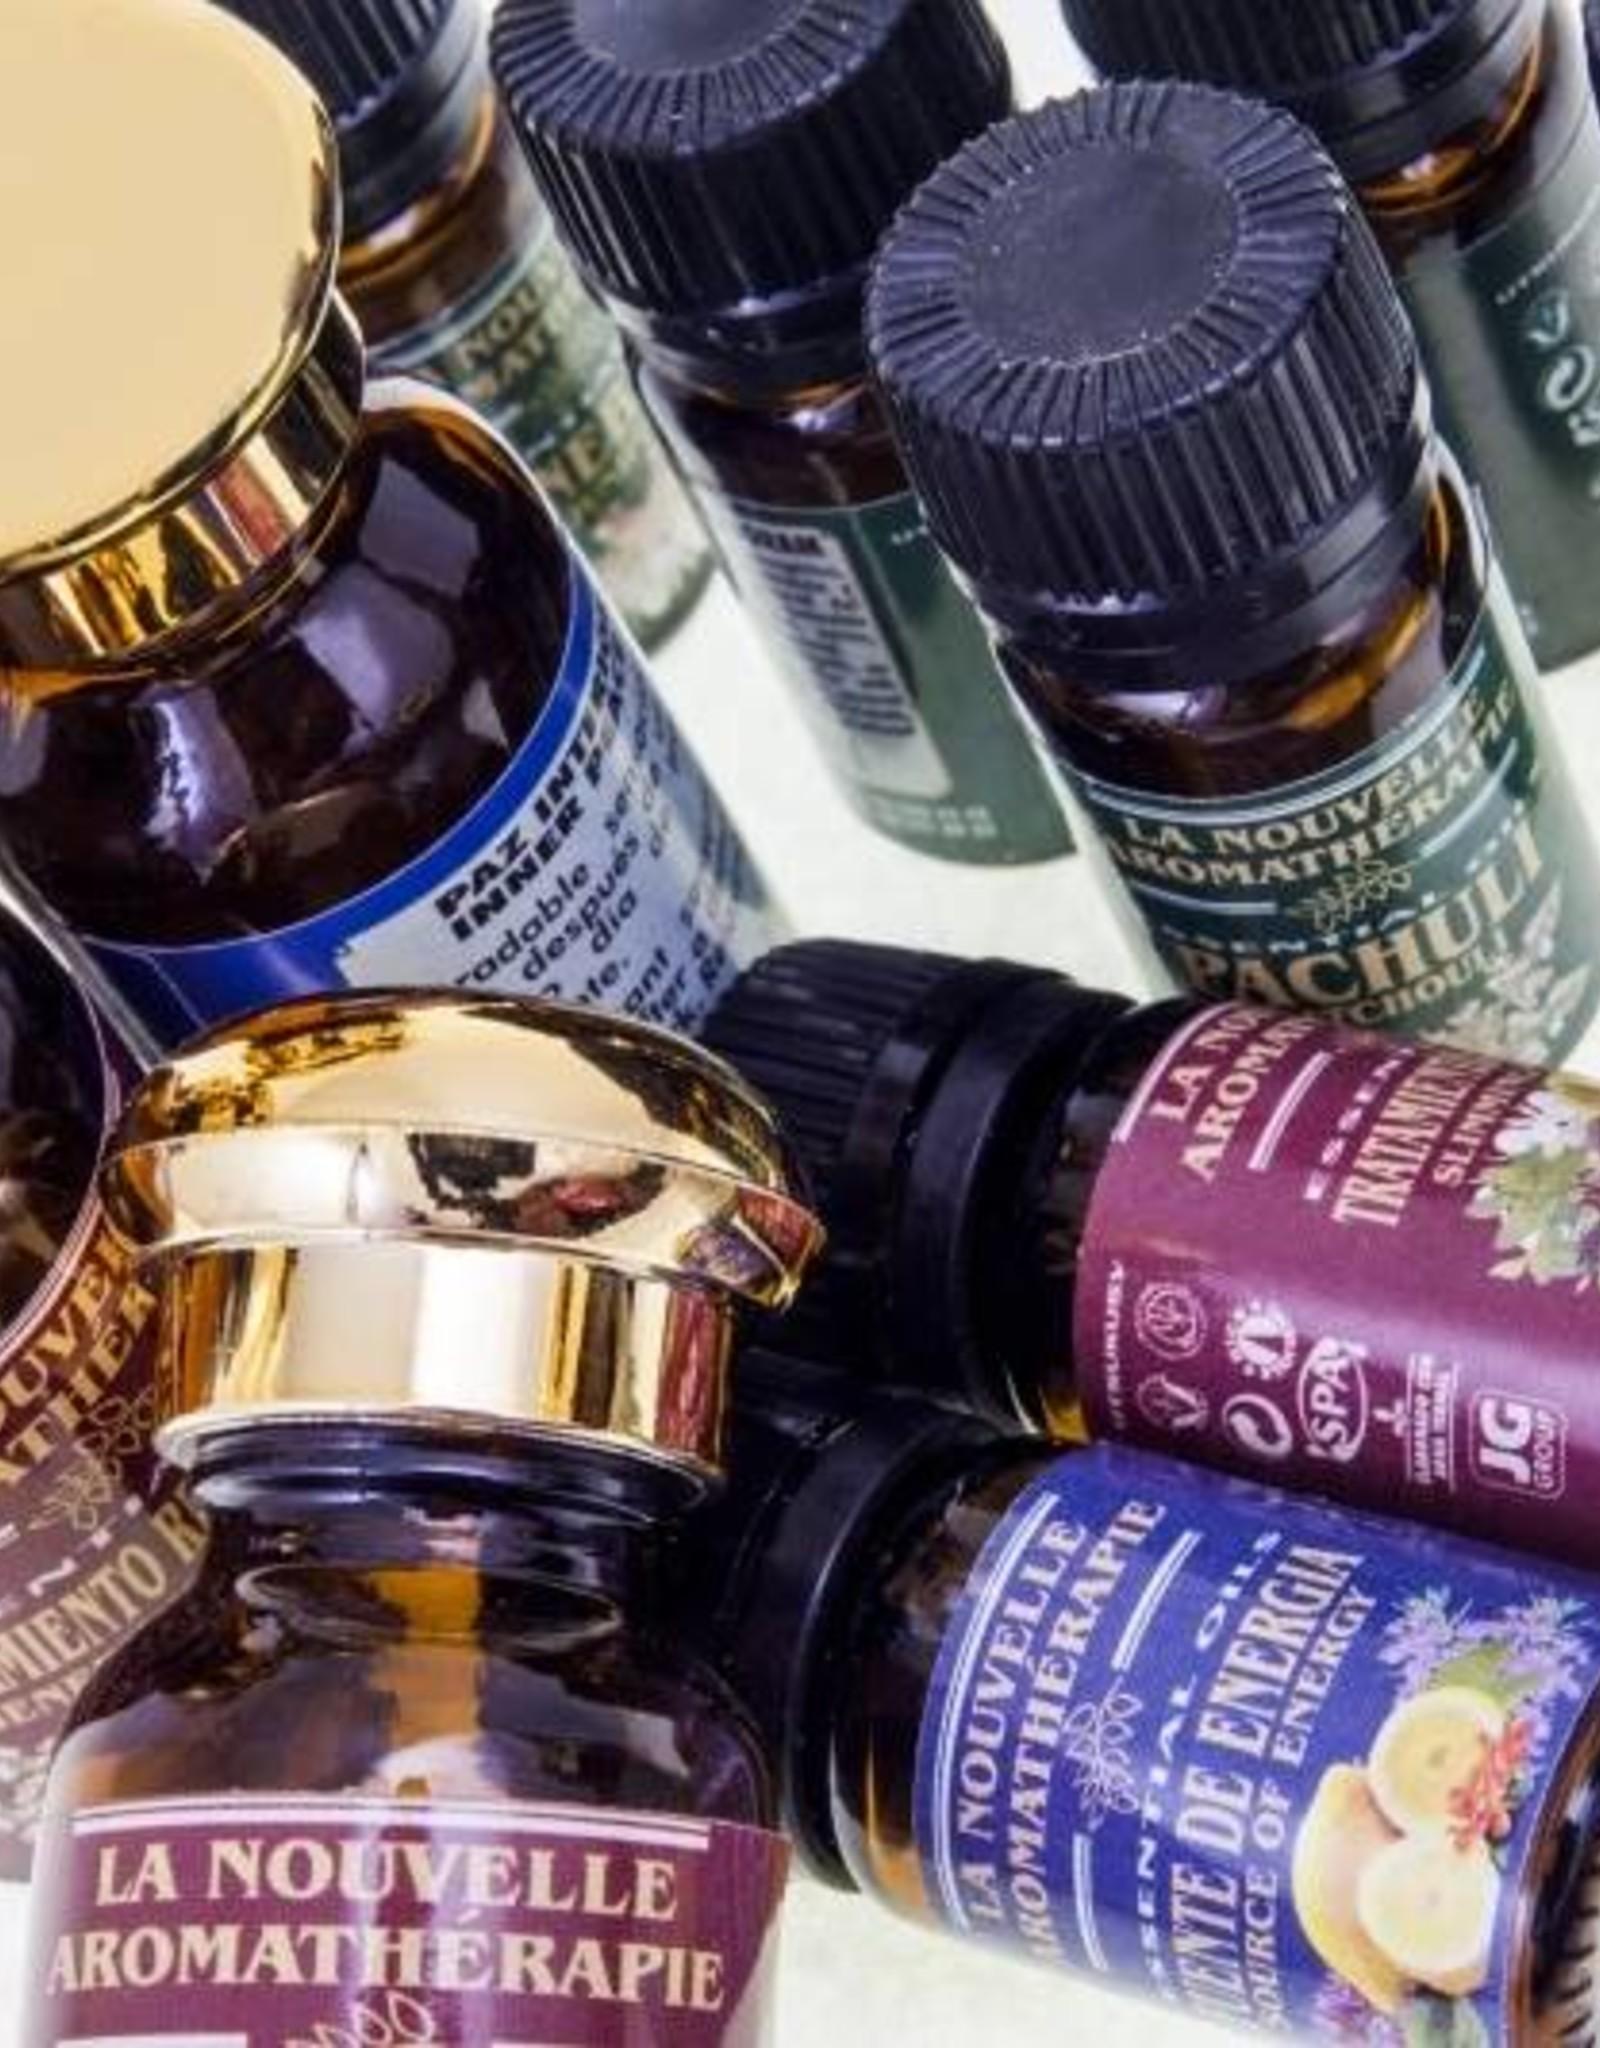 Utsukusy Cypress essential oil 6ml